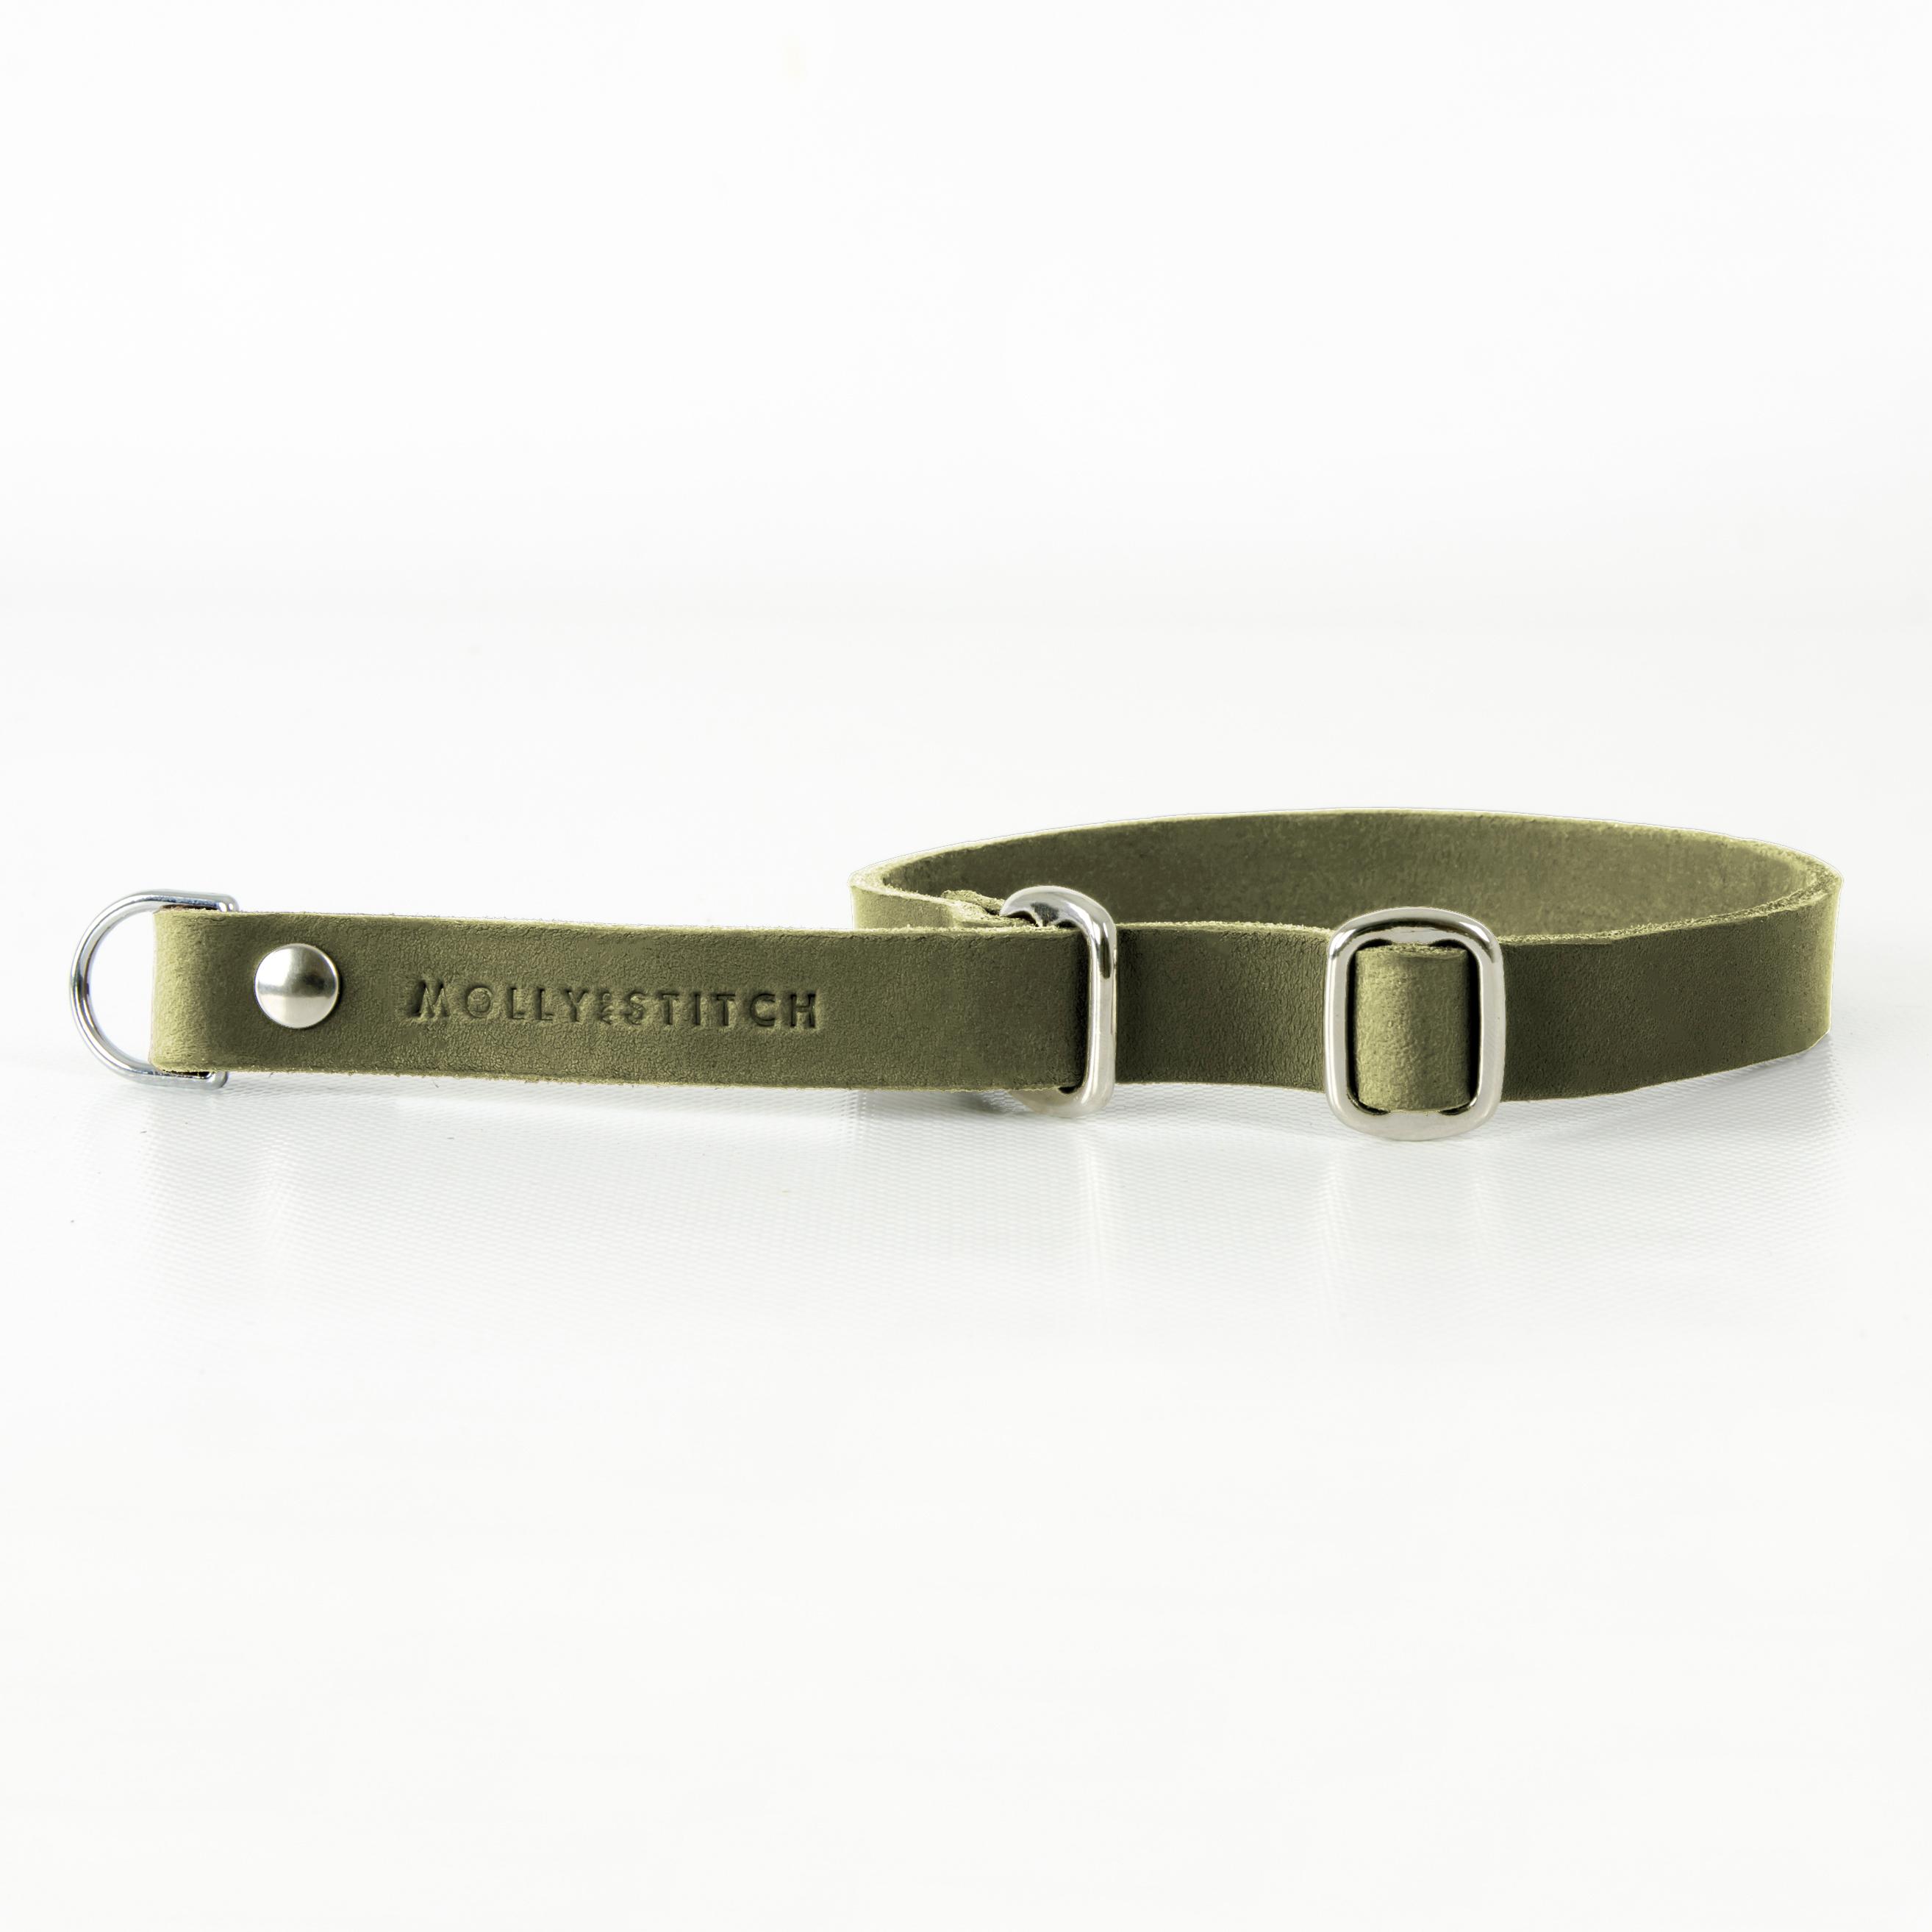 Hundehalsband Retriever silber olive green